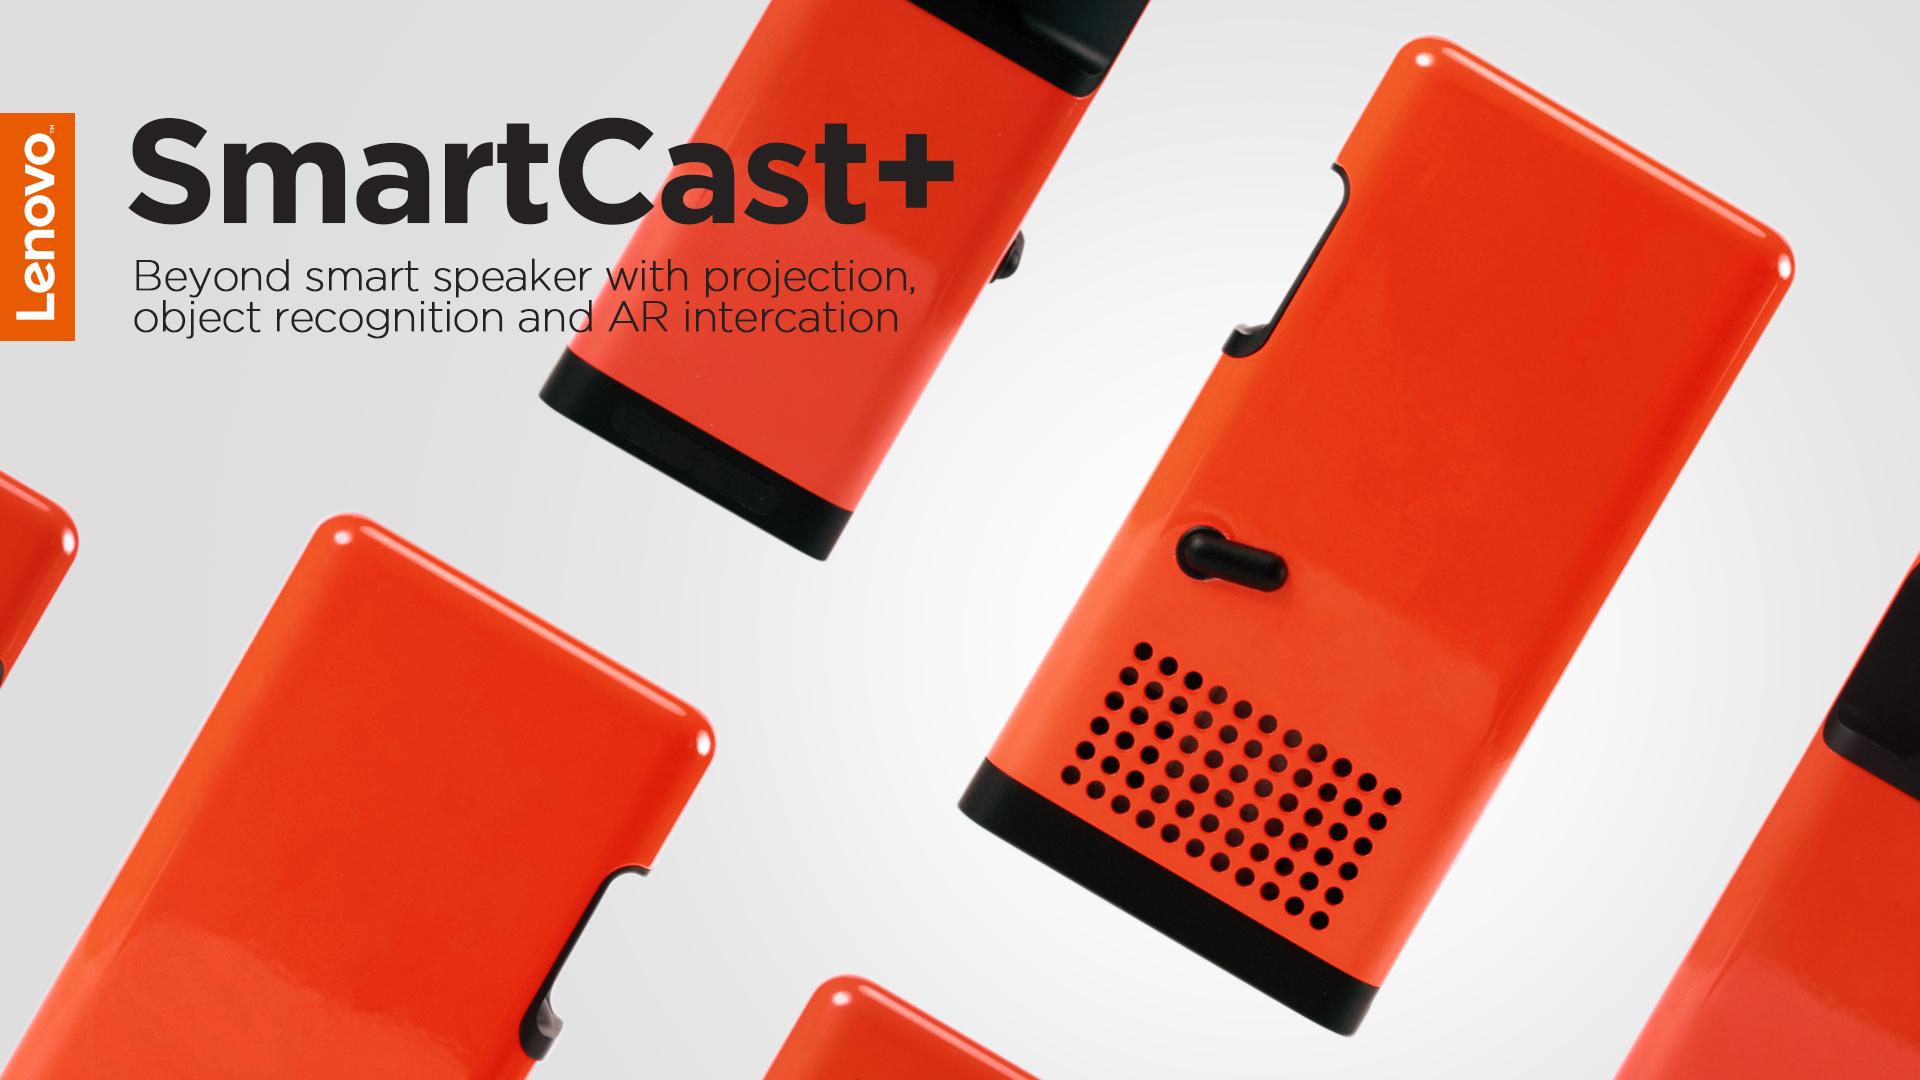 DaystAR is Lenovo's New Concept Design For An AR Headset